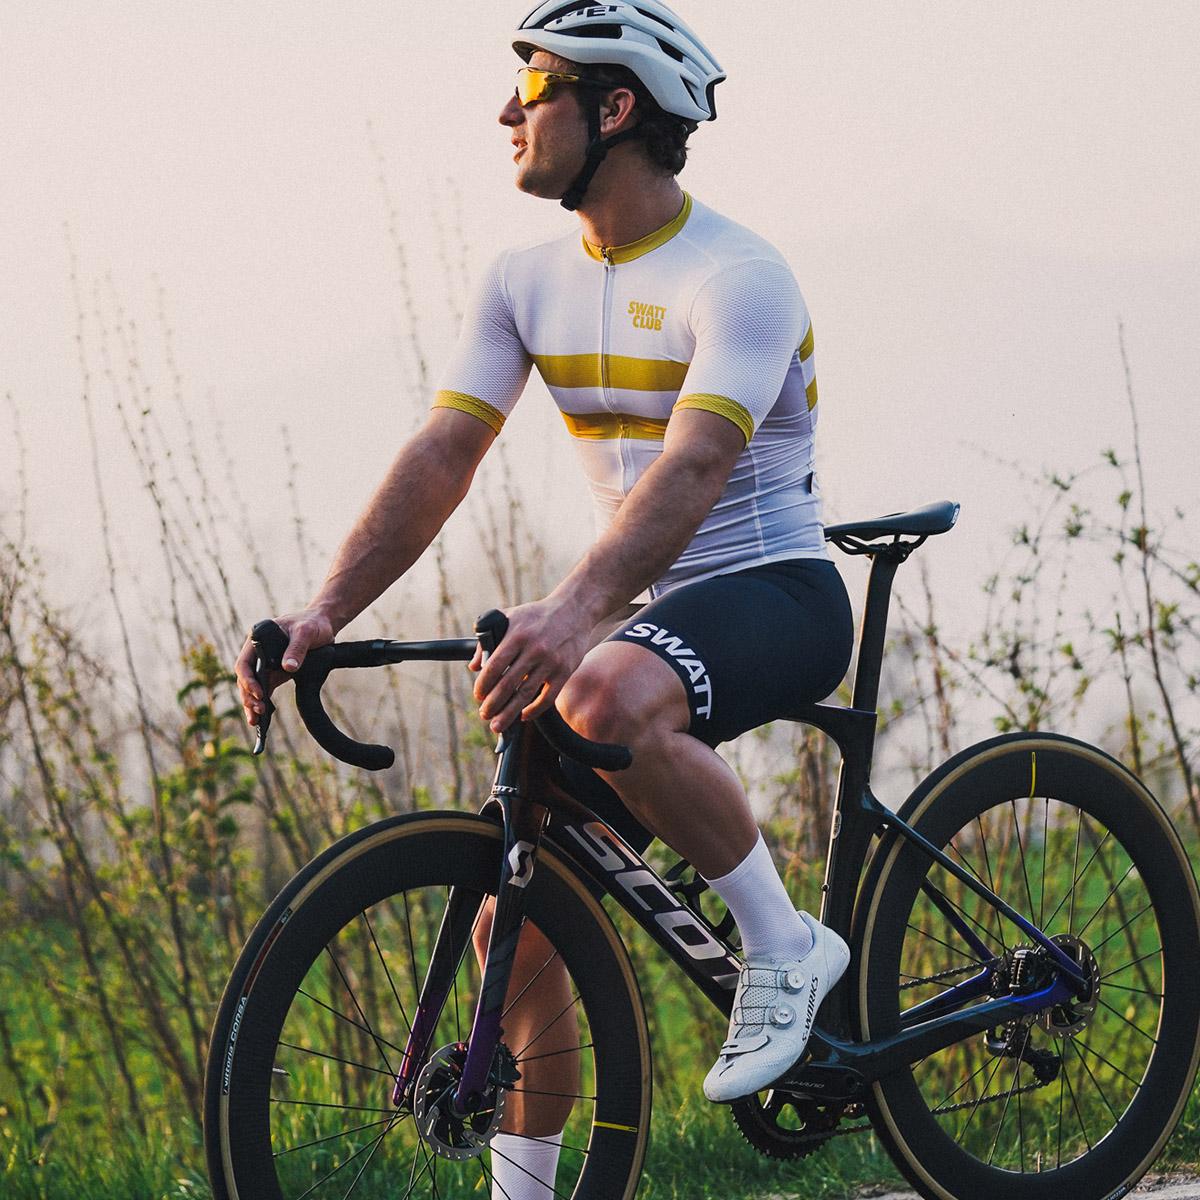 Papale swatt club cycling jersey